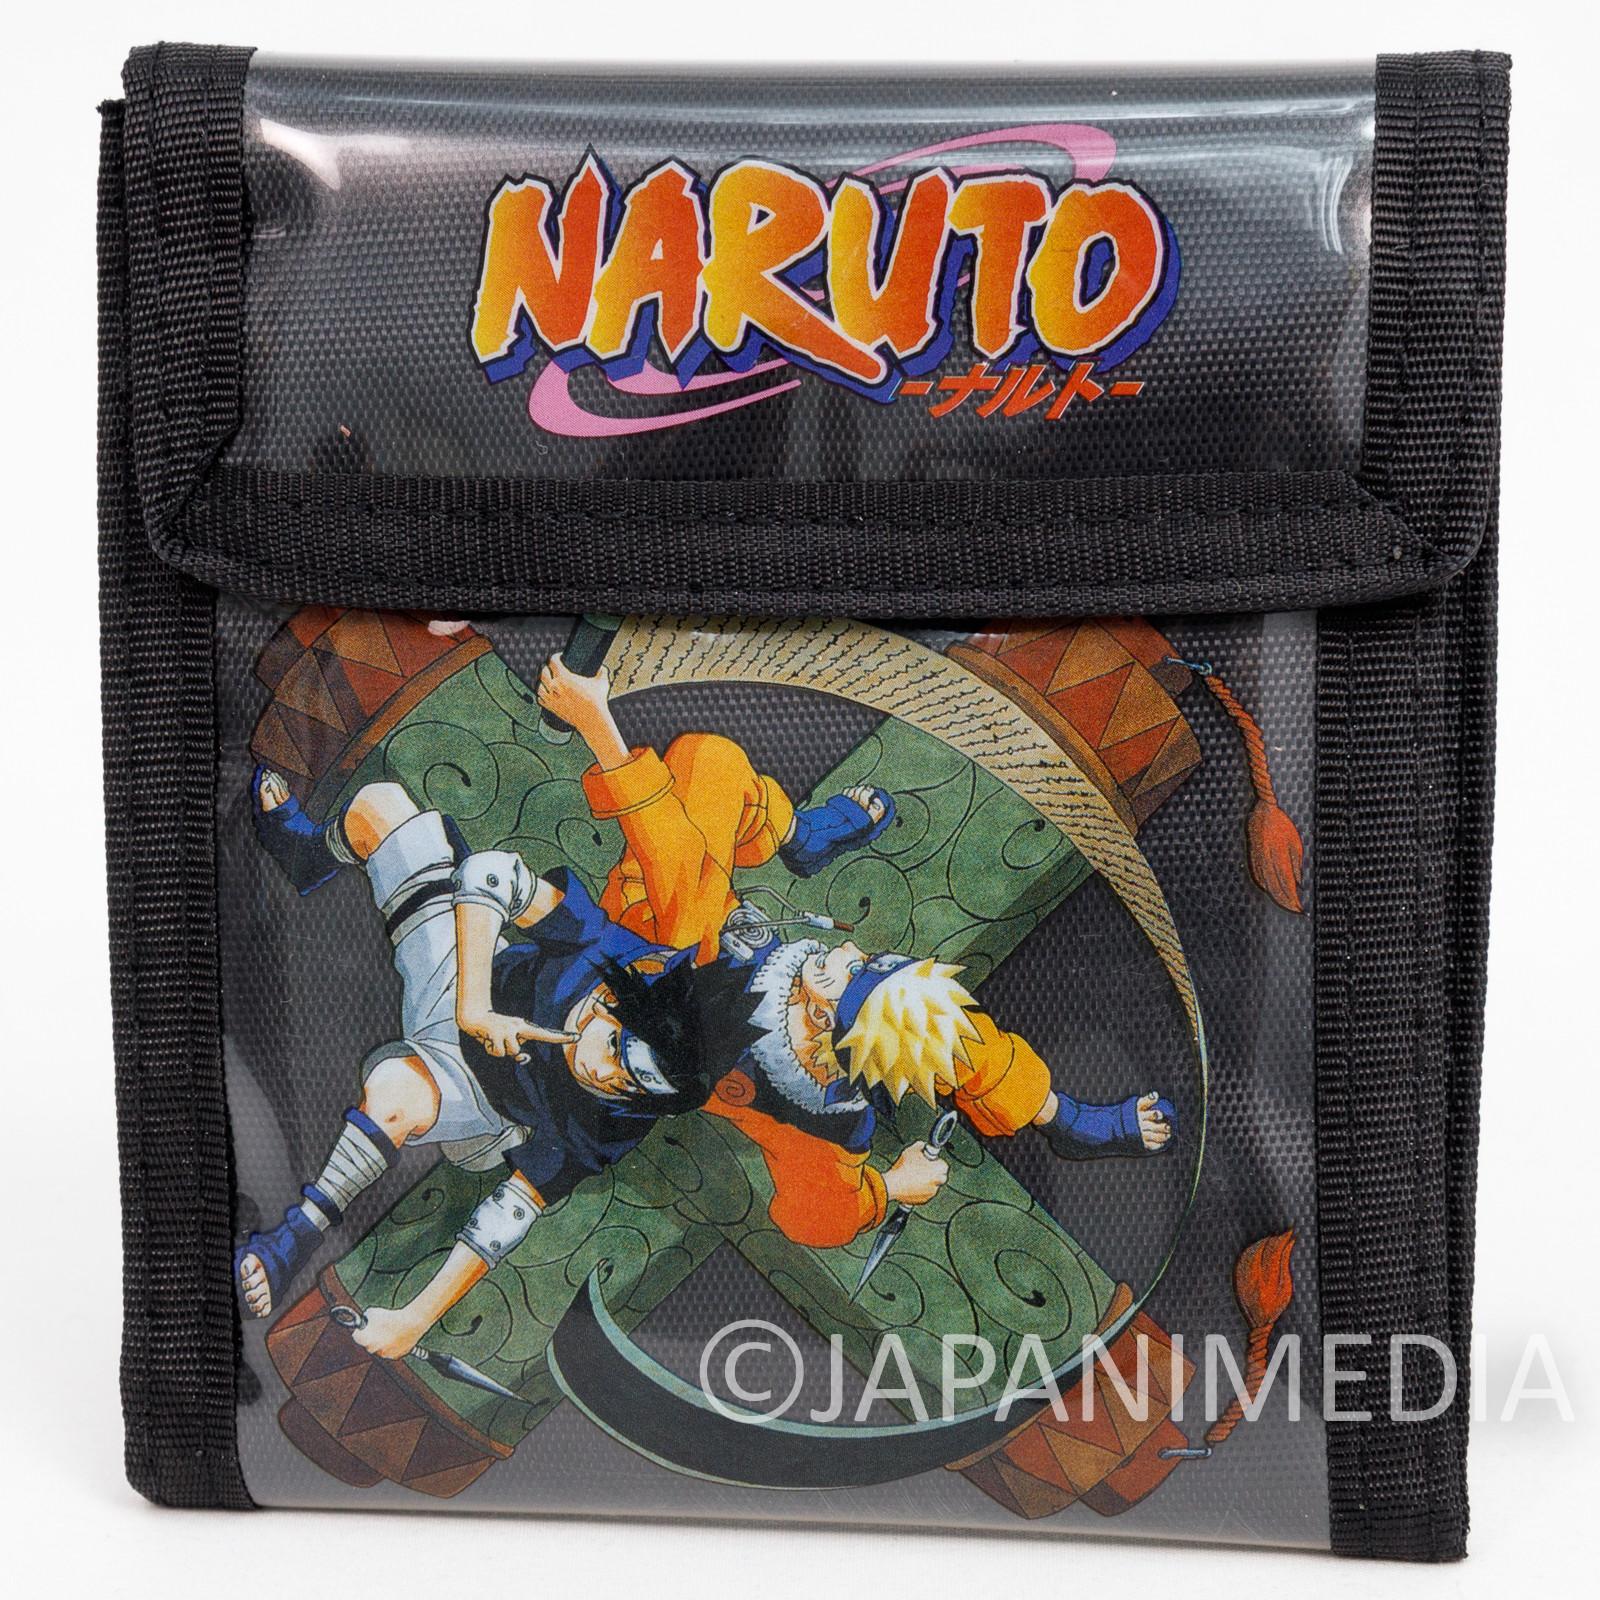 Naruto Shippuden Wallet Purse Jump Festa 2004 JAPAN ANIME